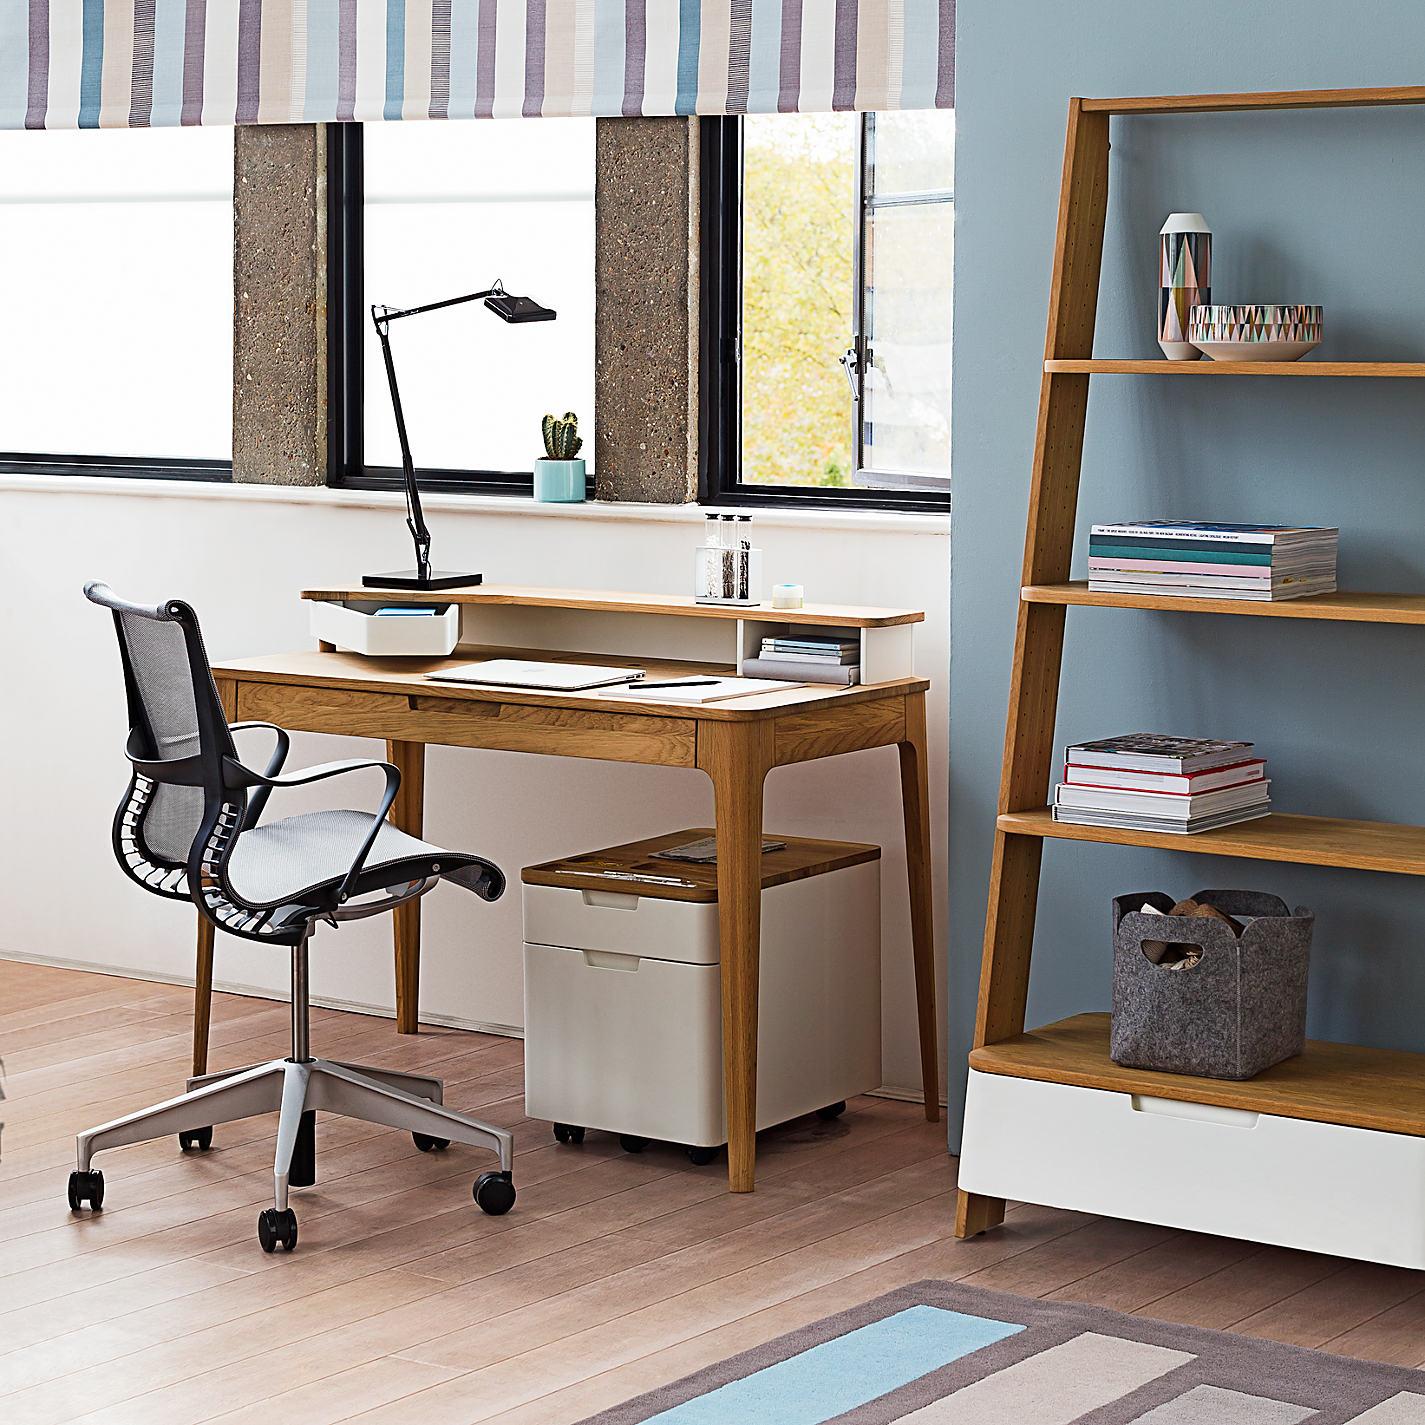 Buy Ebbe Gehl For John Lewis Mira Desk Online At Johnlewis